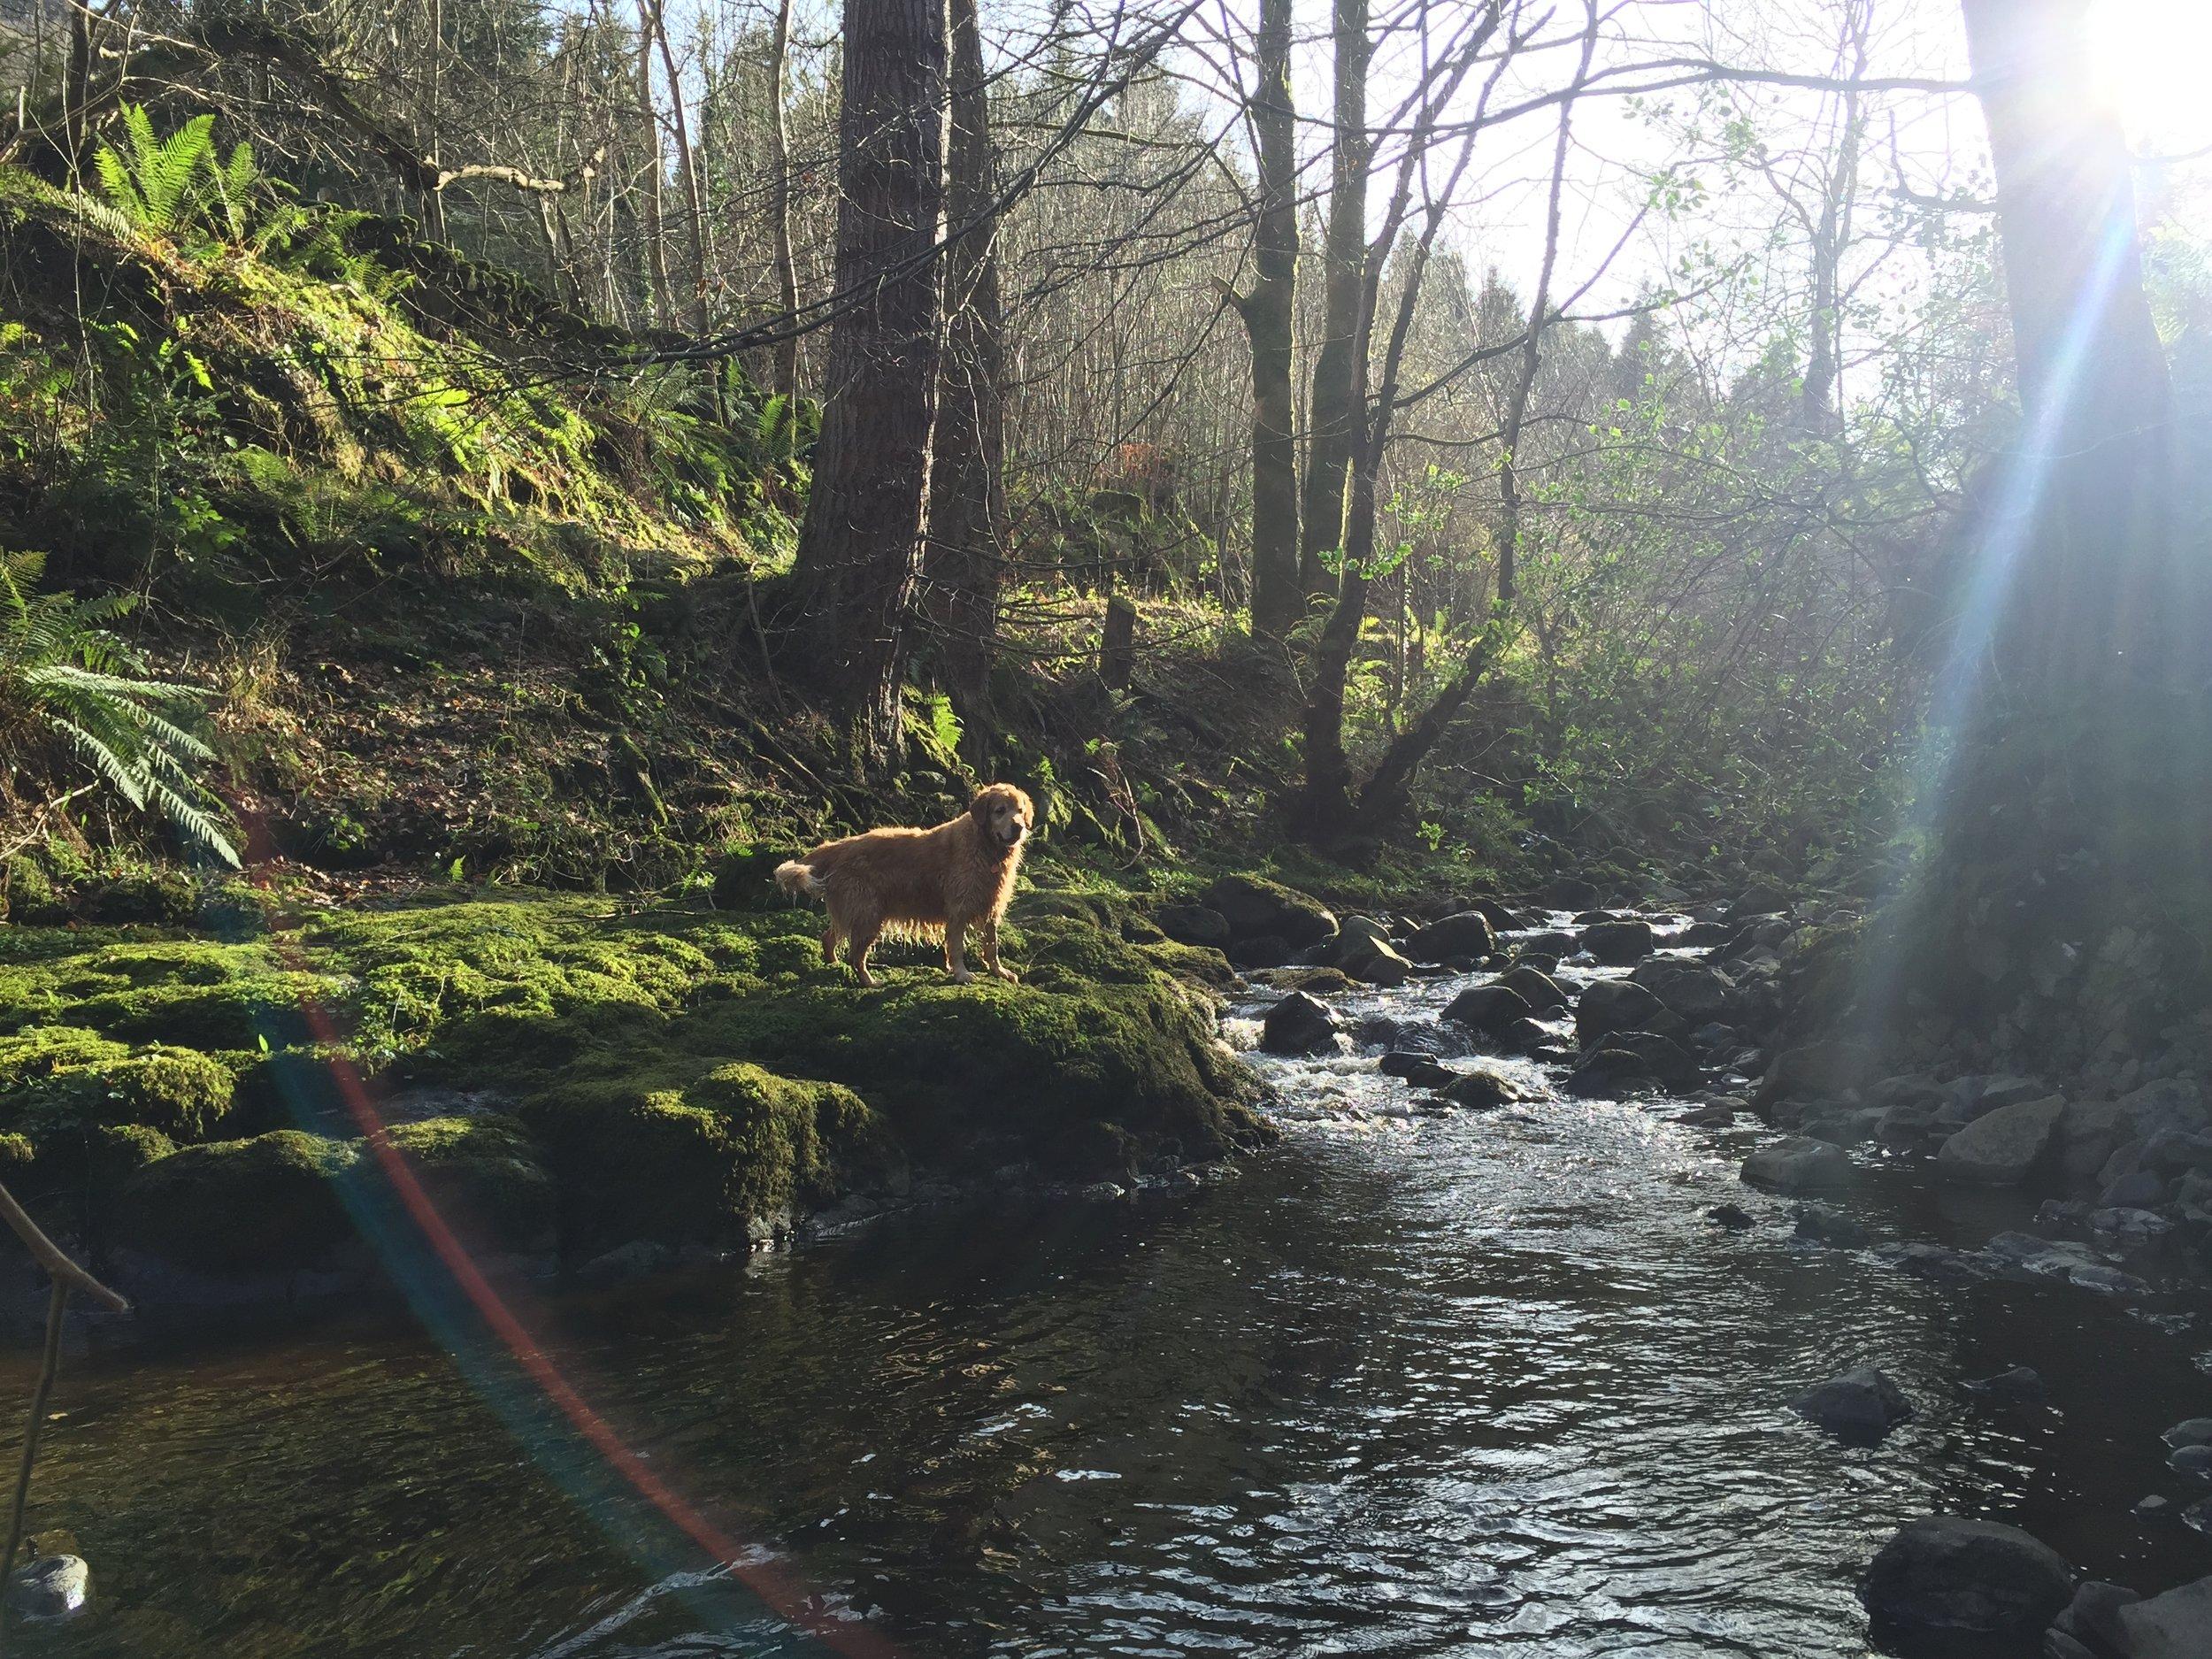 sun_river_forest_golden_retriever_glenariff_glenoe_glenarm_glens_antrim_ni_explorer_niexplorer_northern_ireland_blog.jpg